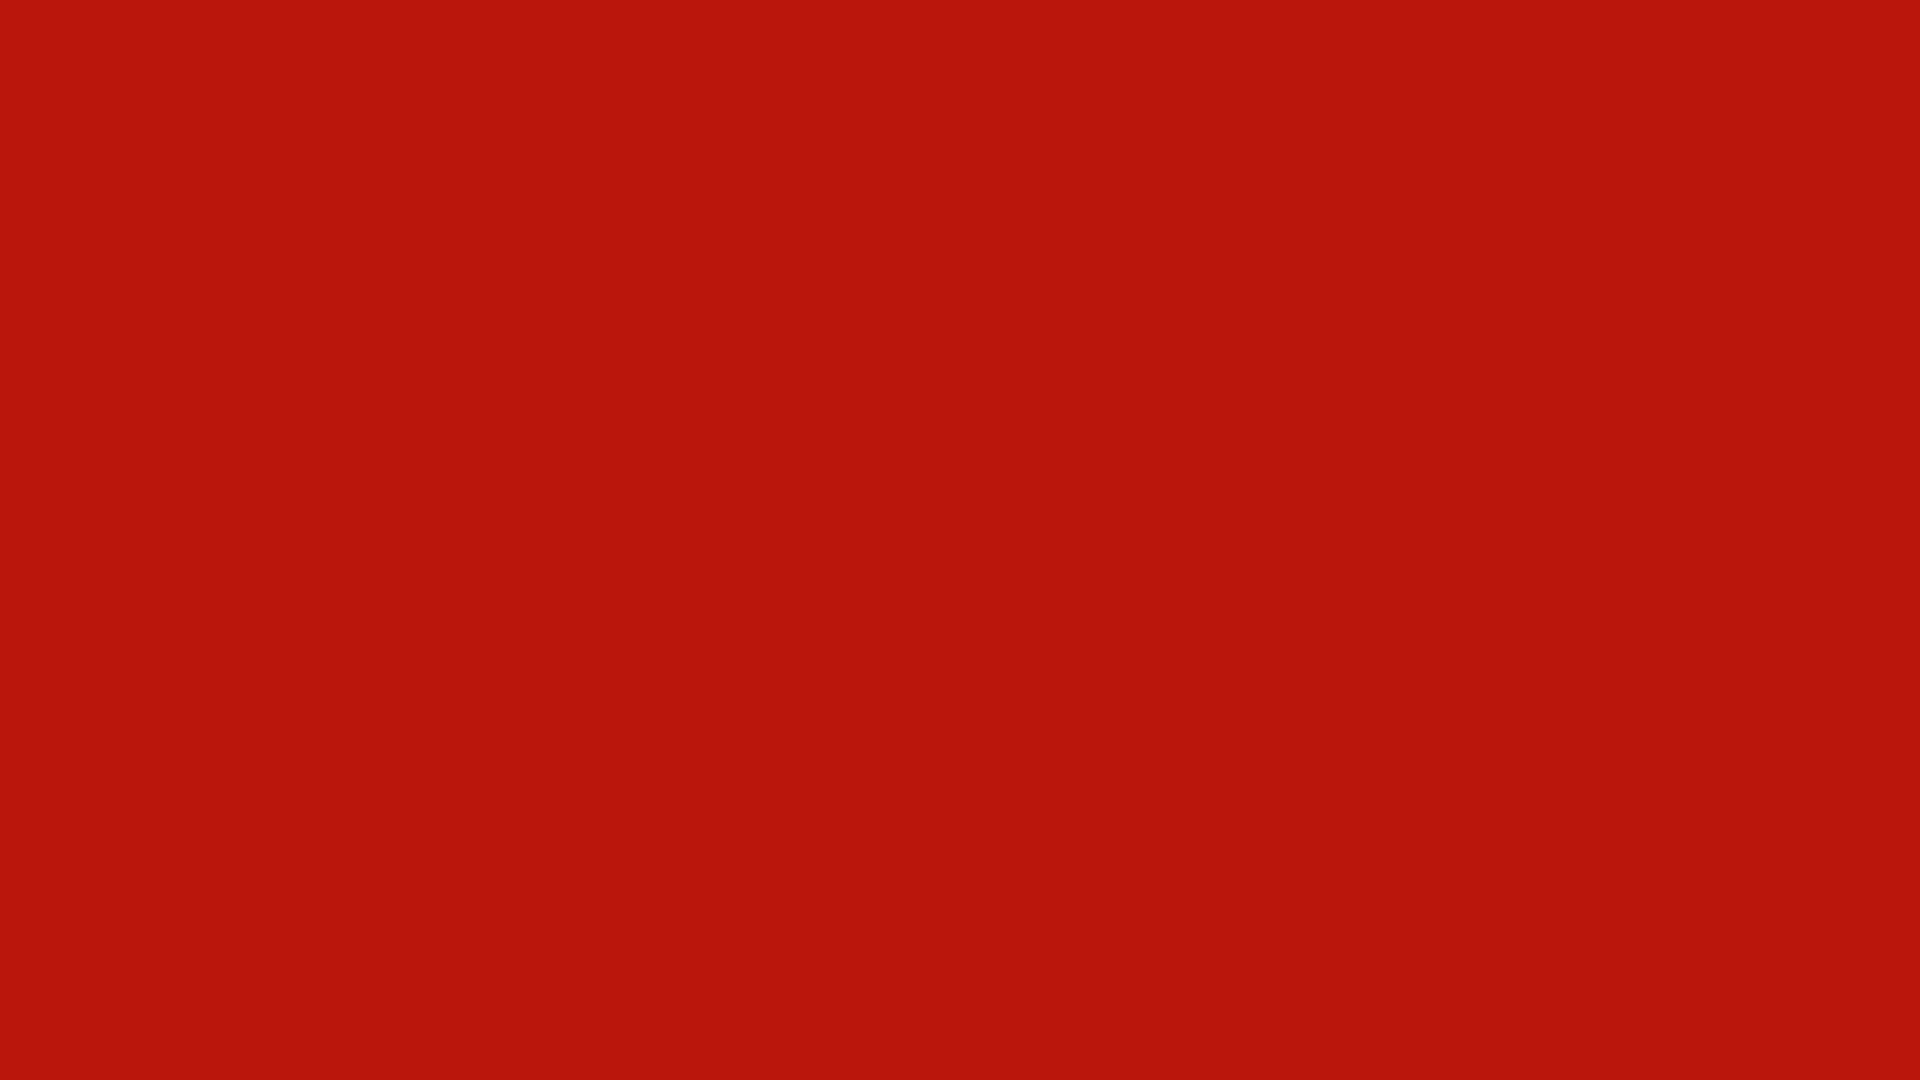 1920x1080 International Orange Engineering Solid Color Background